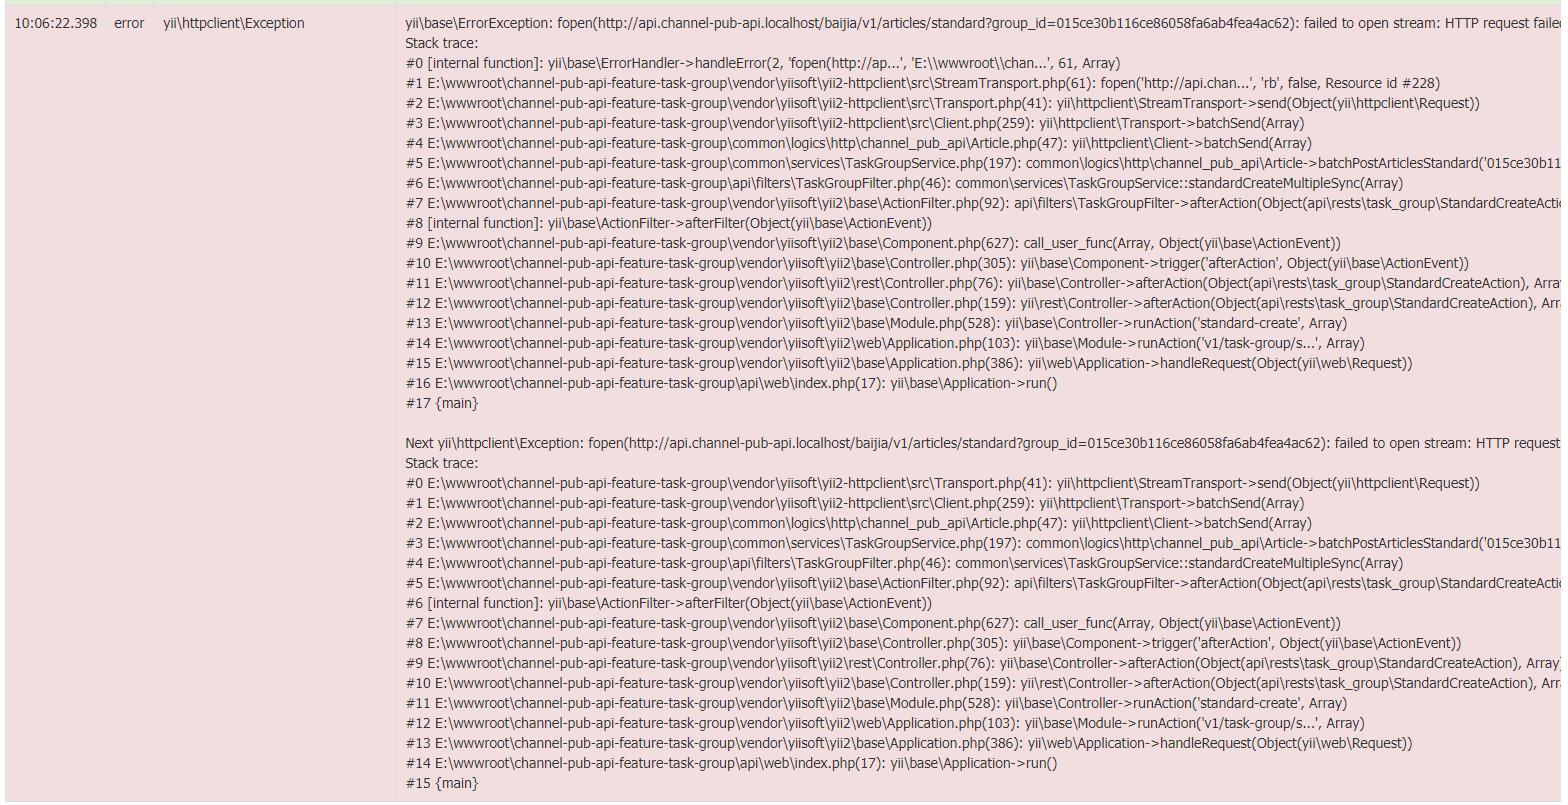 Nginx + php-fpm 在 Windows 10 下的情况表现,当在一个请求(http://api.channel-pub-api.localhost)中 CURL 另一个请求(http://api.channel-pub-api.localhost)时,报错:fopen(http://api.channel-pub-api.localhost/qq/v1/articles/standard?group_id=015ce30b116ce86058fa6ab4fea4ac63): failed to open stream: HTTP request failed! 。